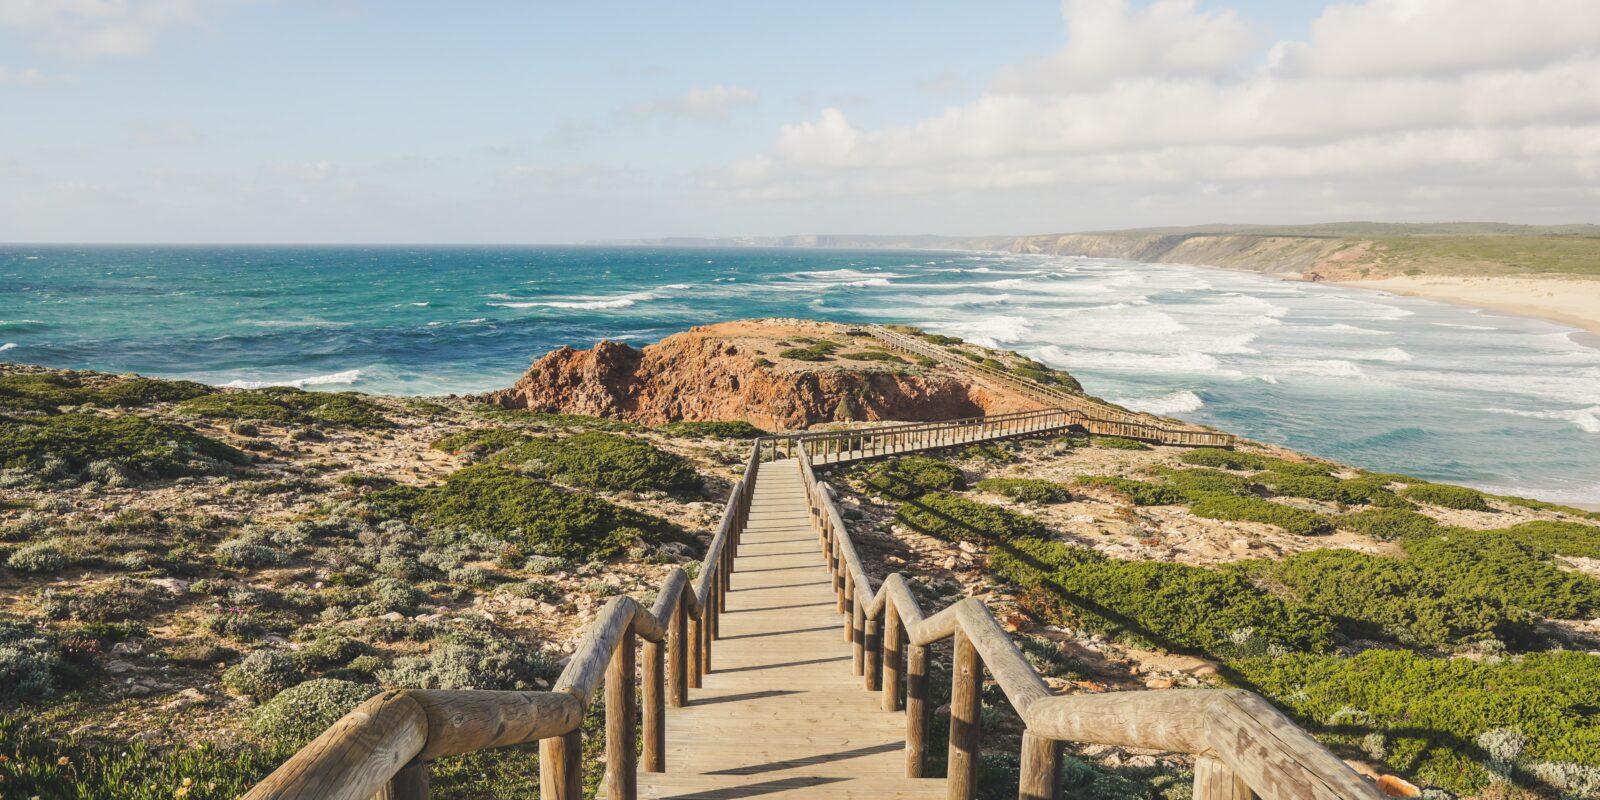 Hvor skal man bo på Algarvekysten? Se de bedste byer i Algarve